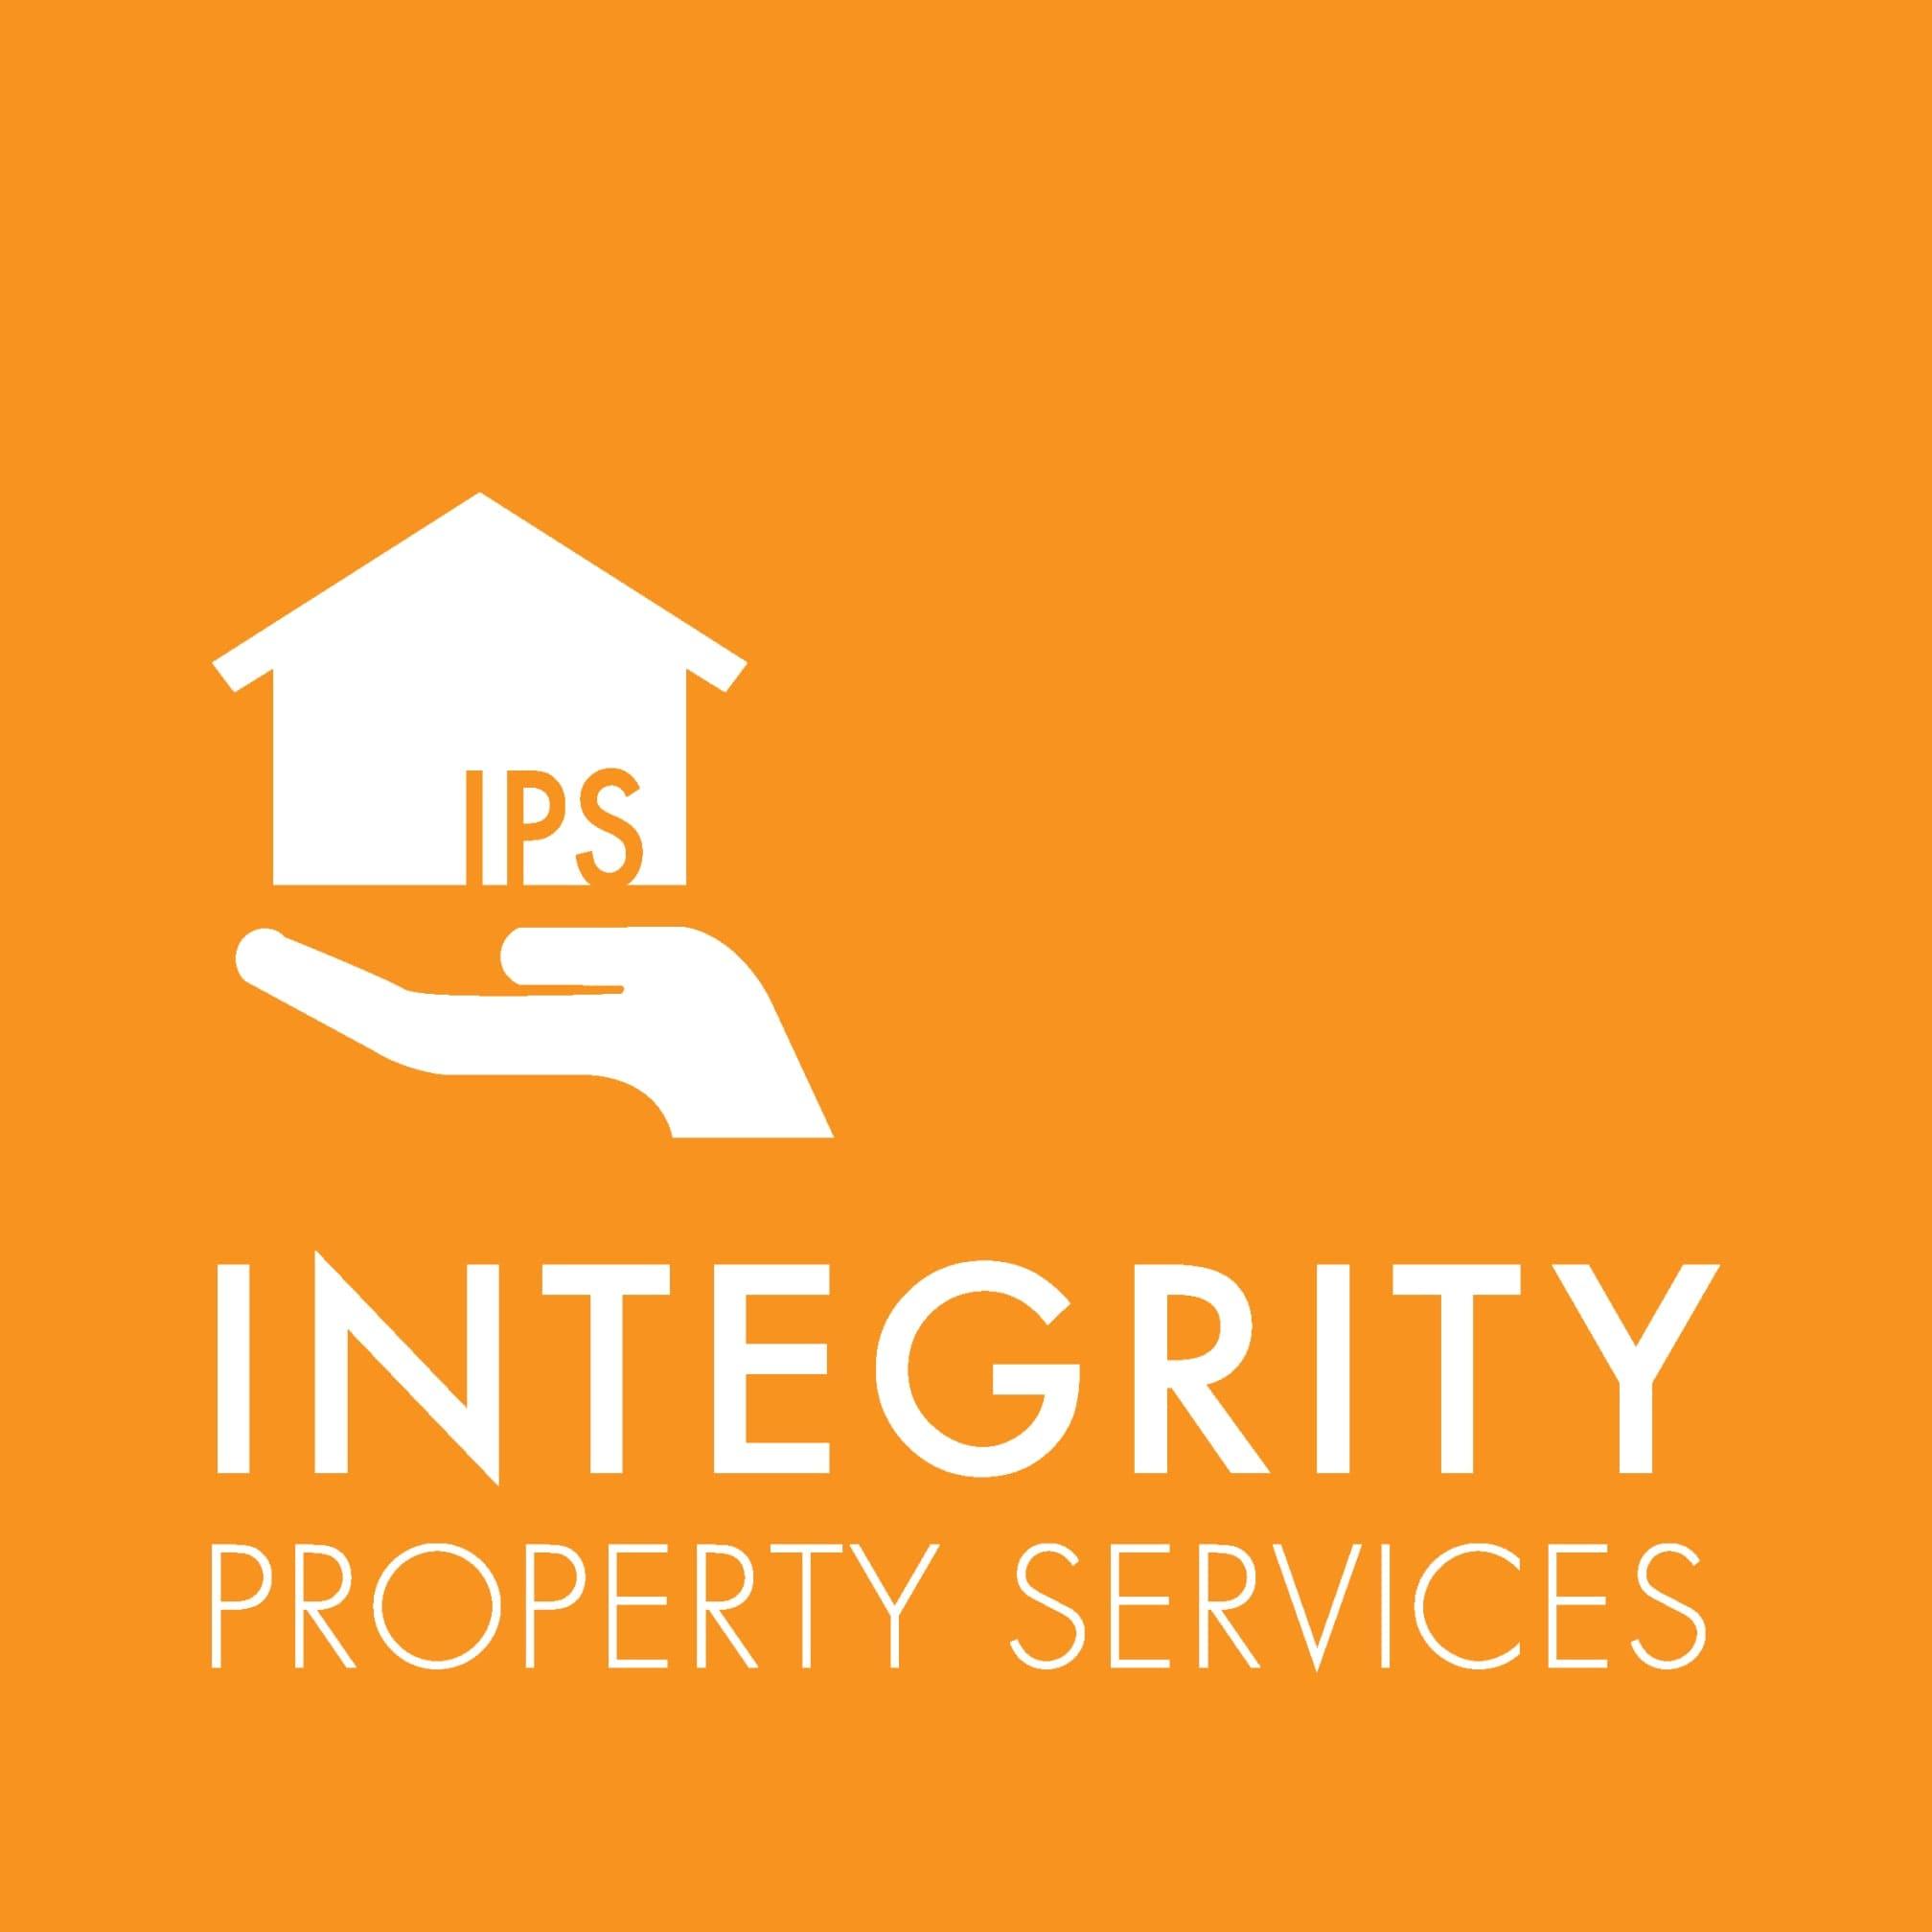 Integrity Property Services - London, London SE15 4PU - 020 3371 0713 | ShowMeLocal.com